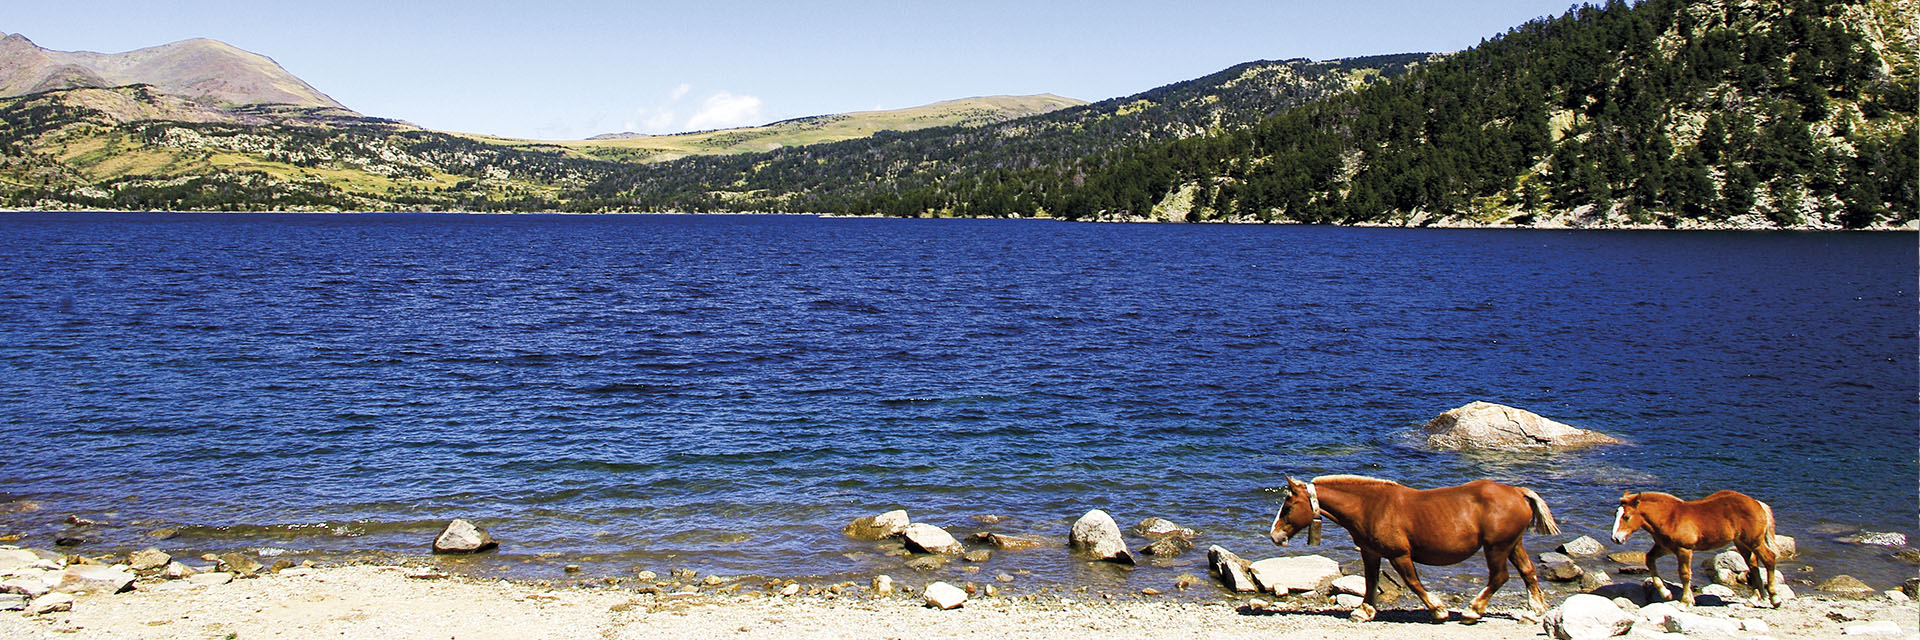 village-vacance-chalet-ma-neou-lac